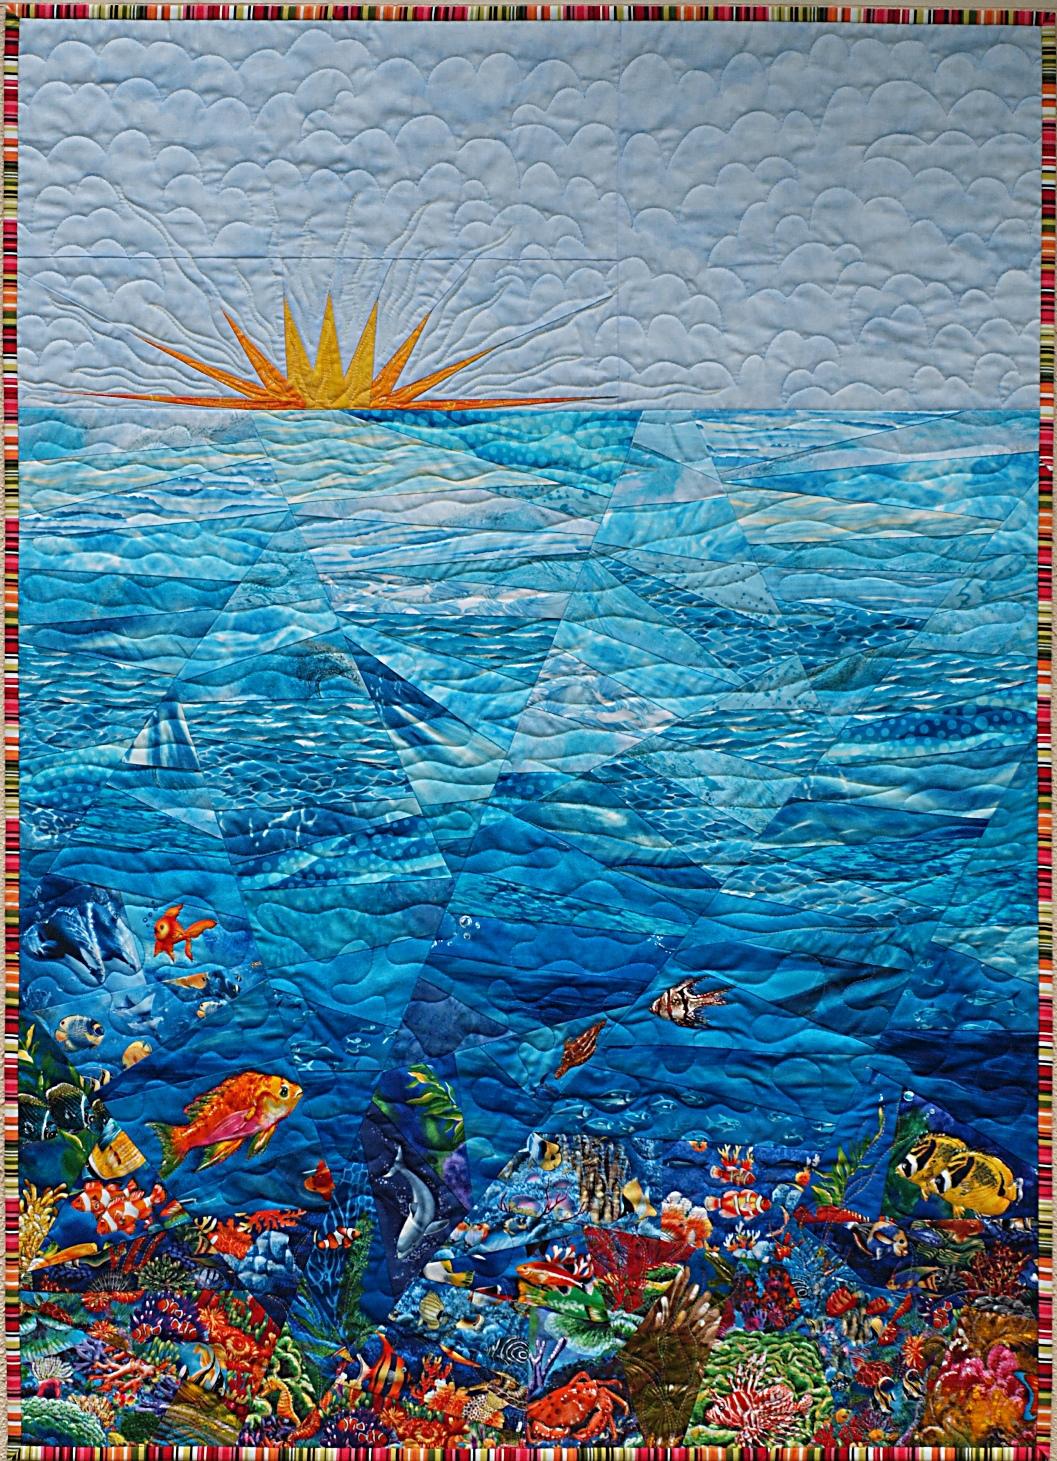 Sampaguita Quilts 2010 At Sampaguita Quilts